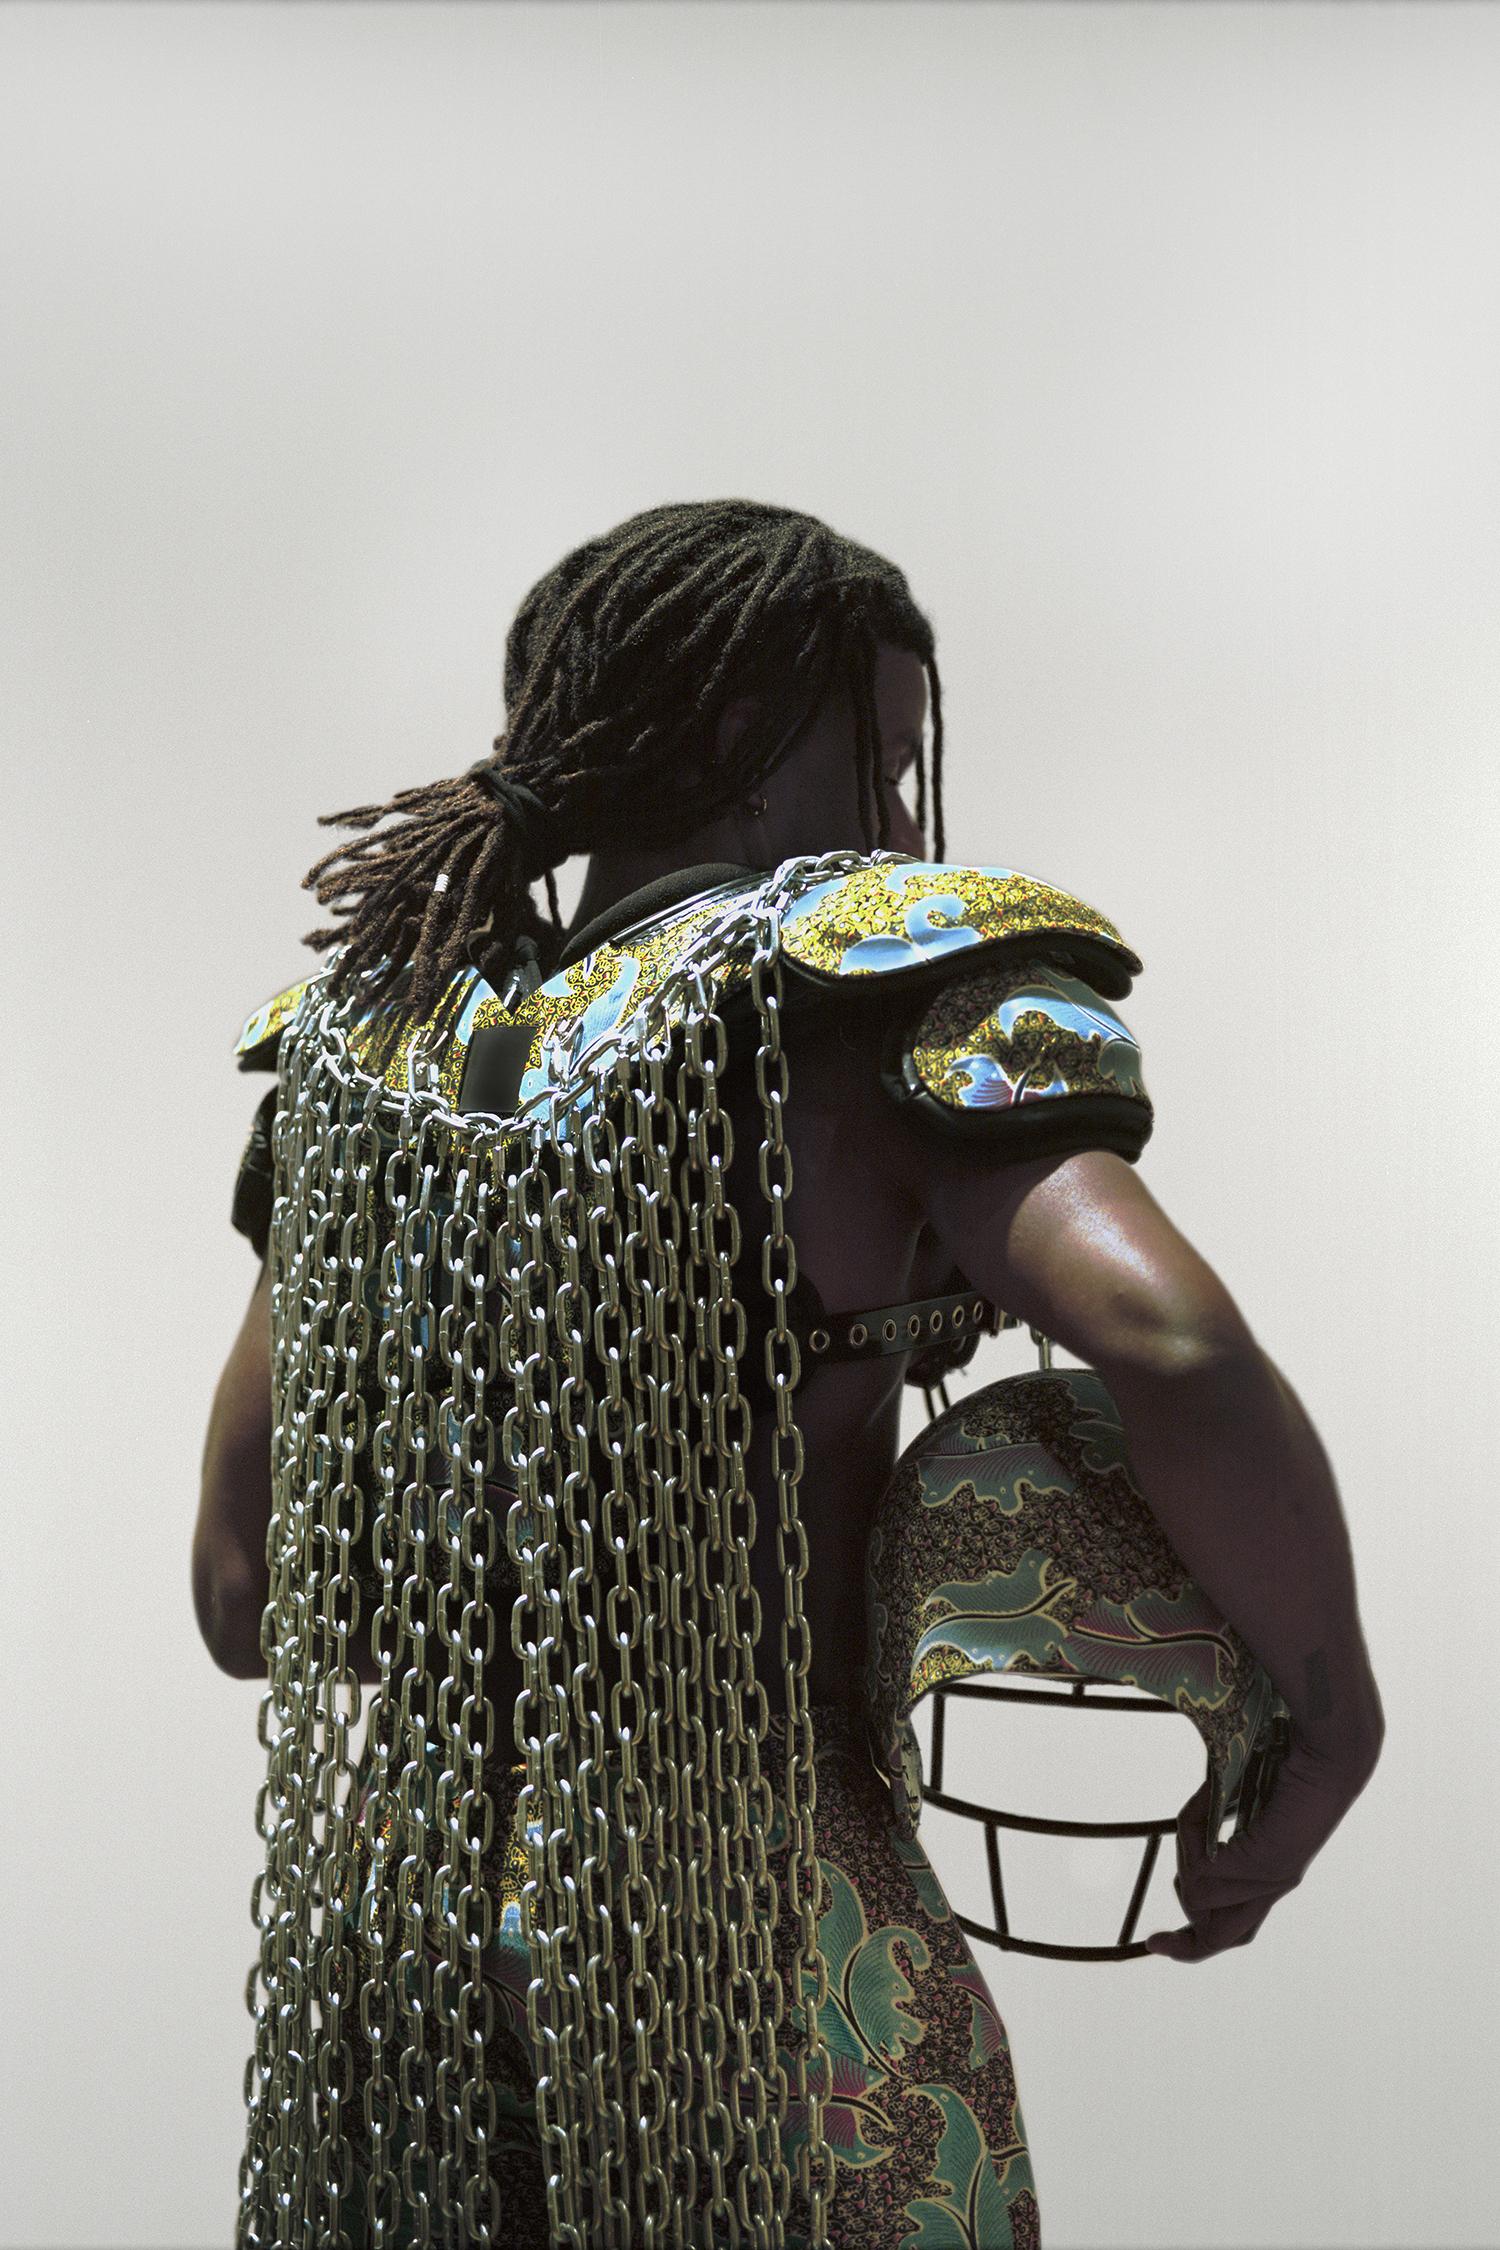 Untitled (No Fields) , 2018, repurposed football gear, African wax print, chain, black astroturf, Nikes